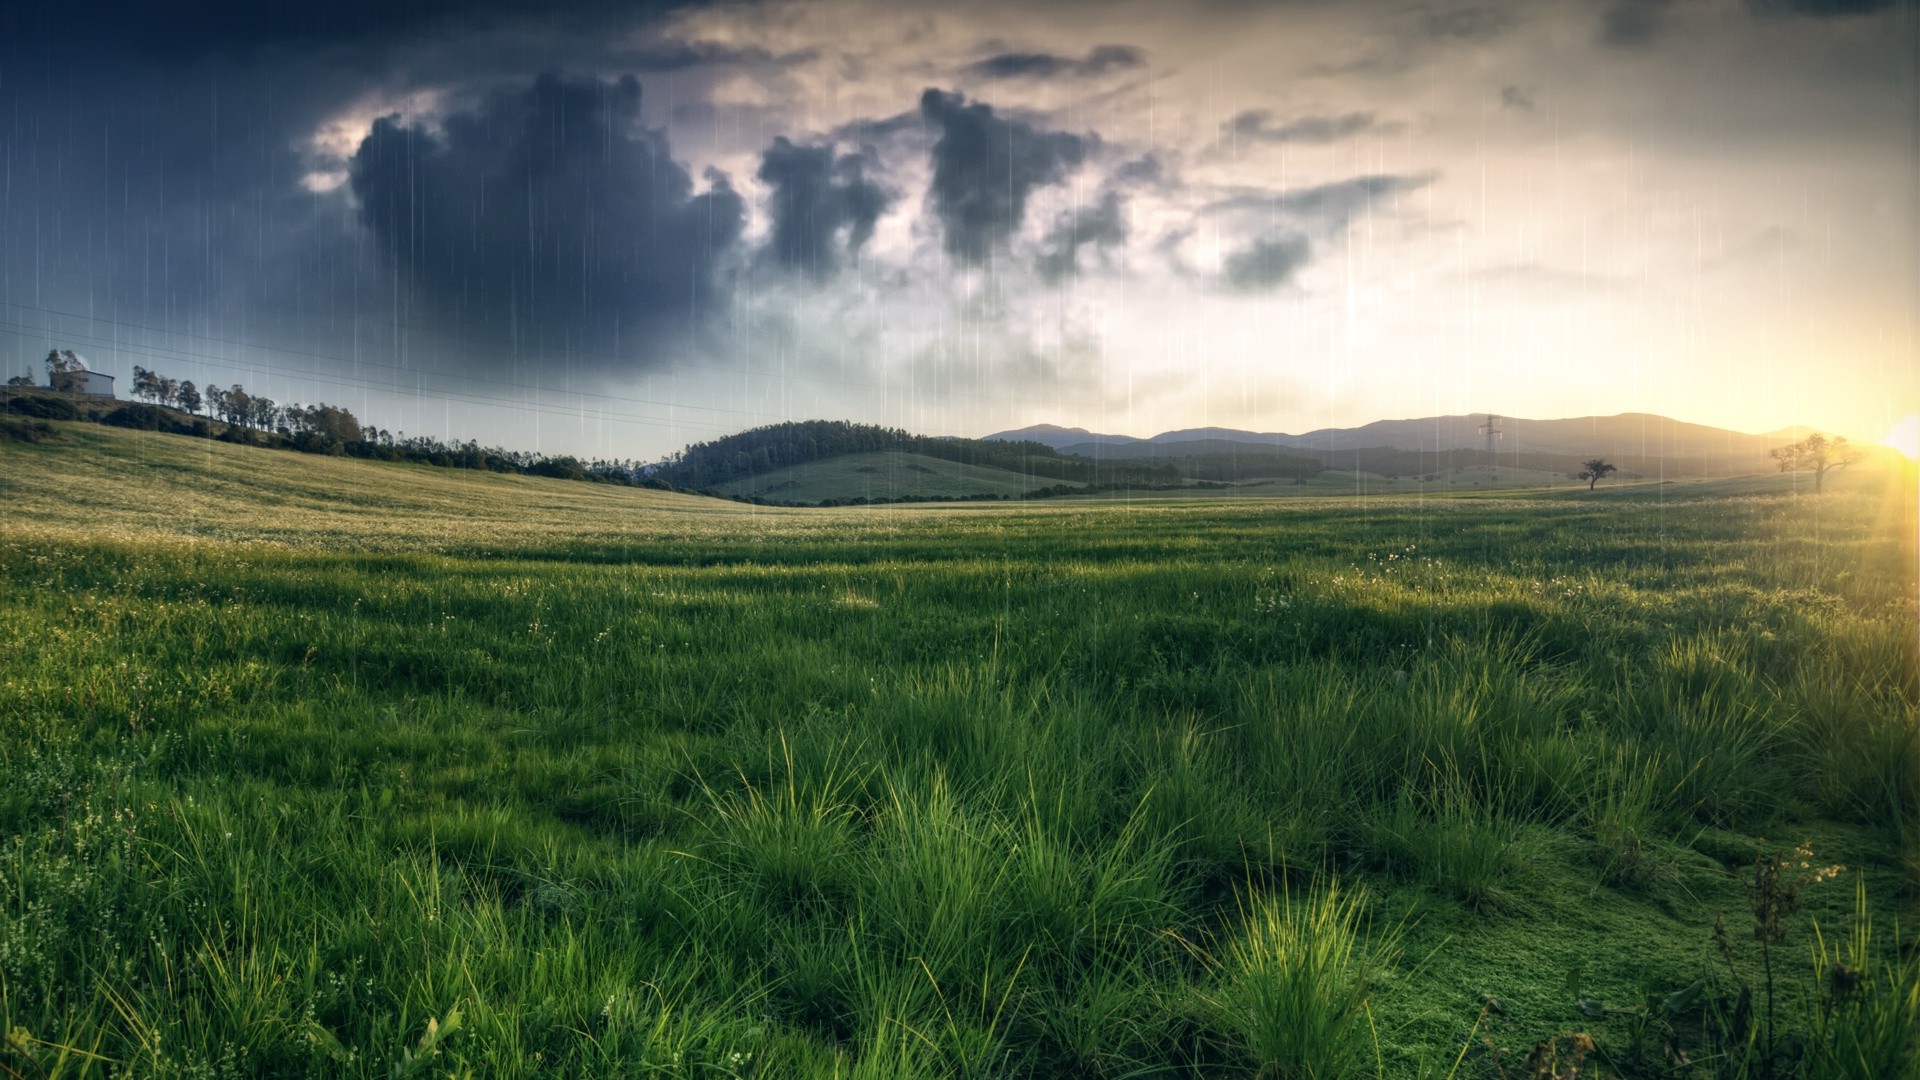 grass, Field, Rain, Nature Wallpapers HD / Desktop and Mobile ...